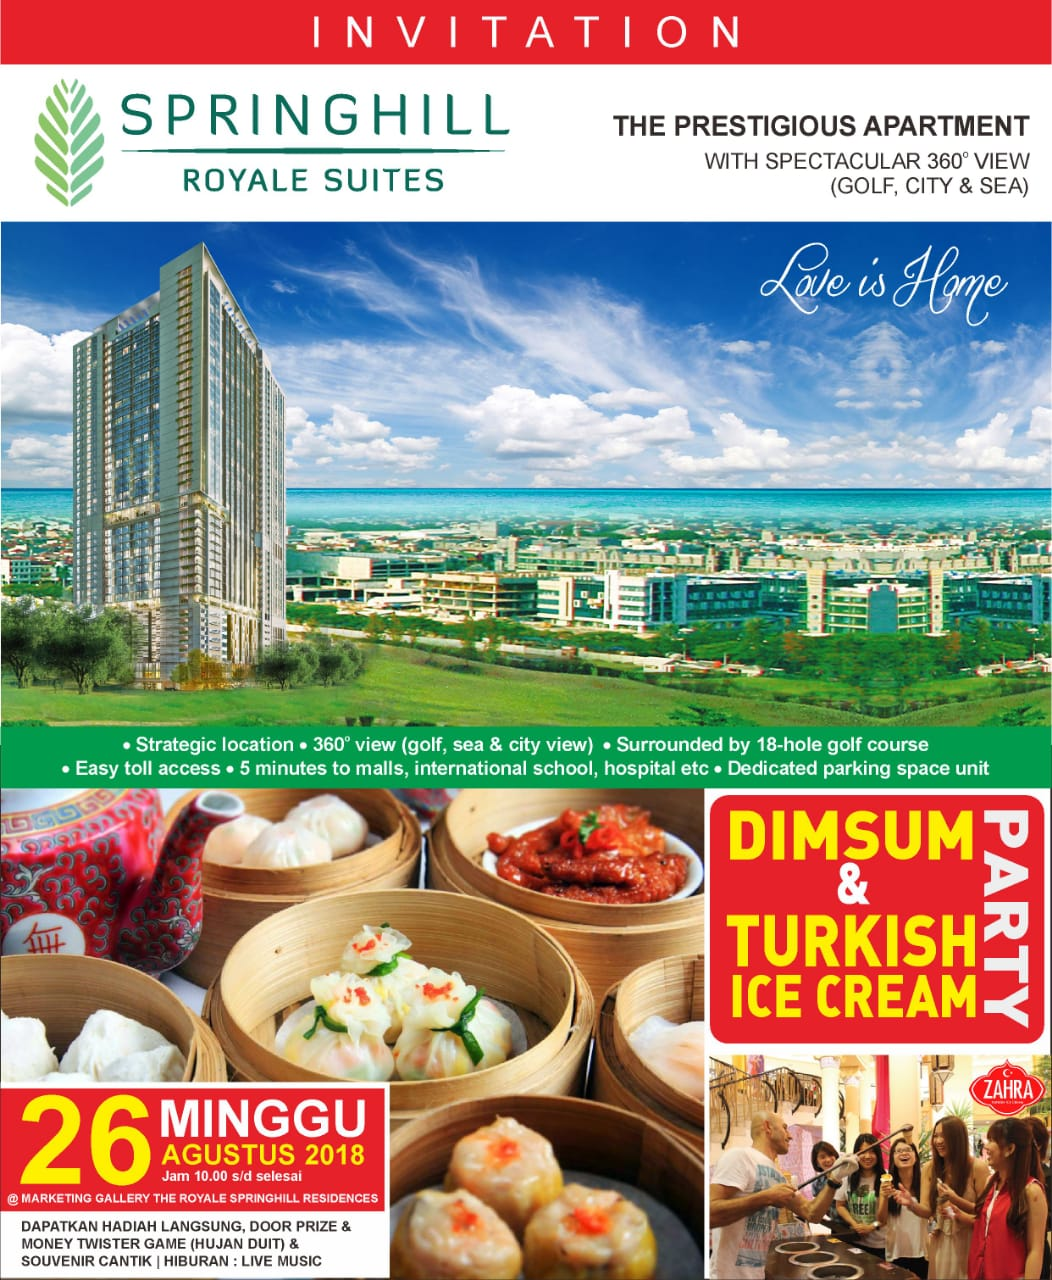 Pesta Dimsum & Es Krim Turki